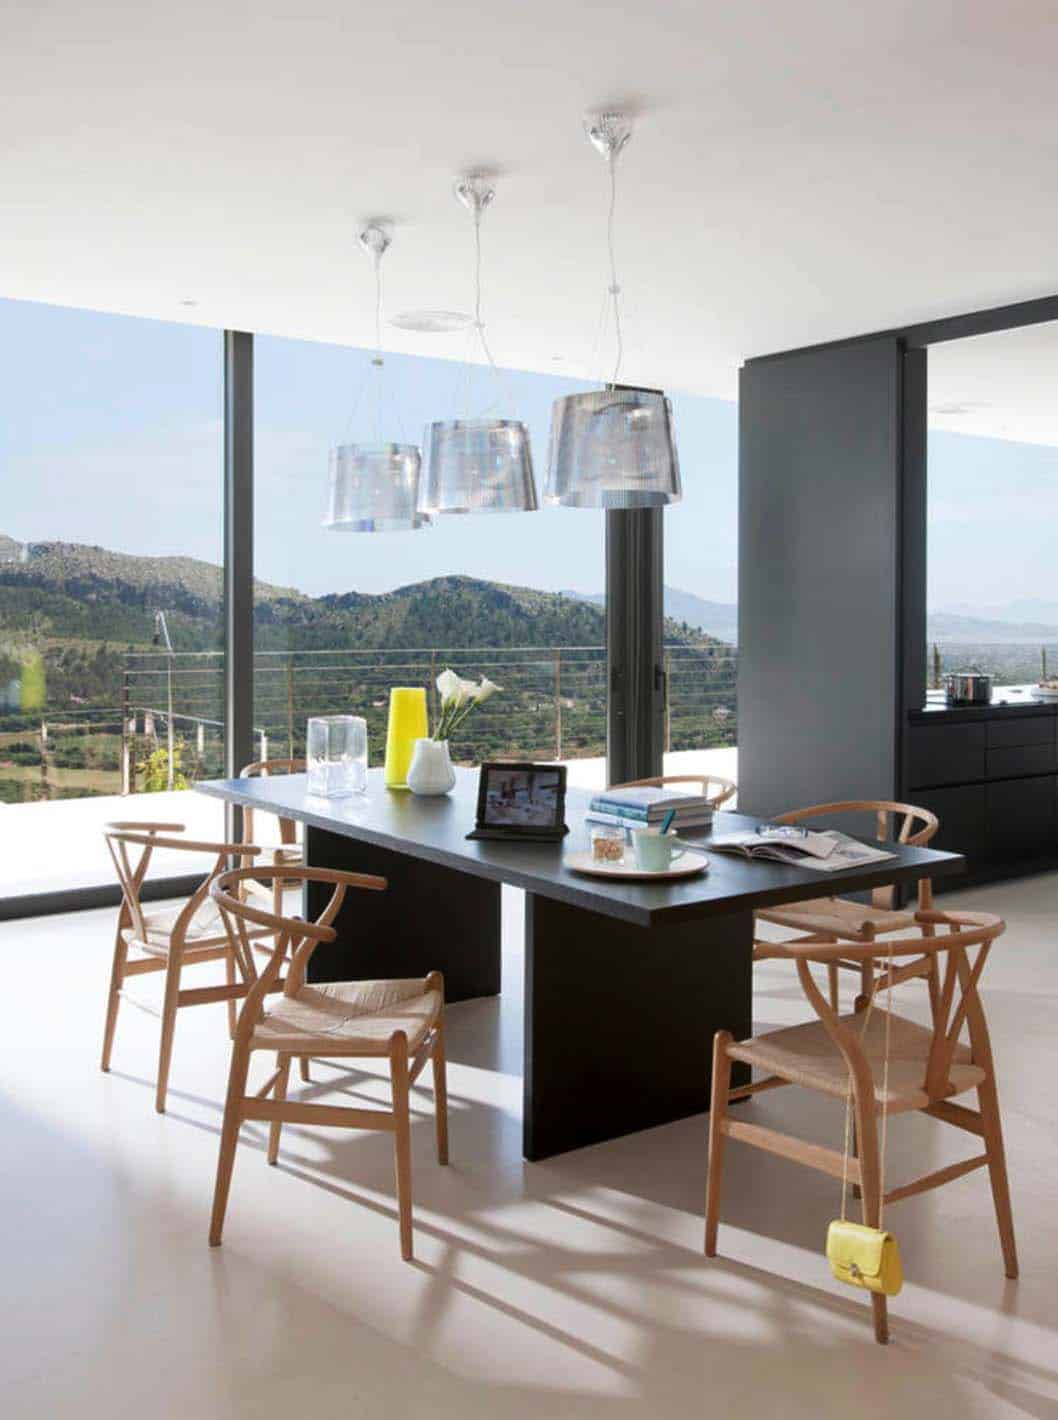 Contemporary Mountain House-Miquel Lacomba-18-1 Kindesign